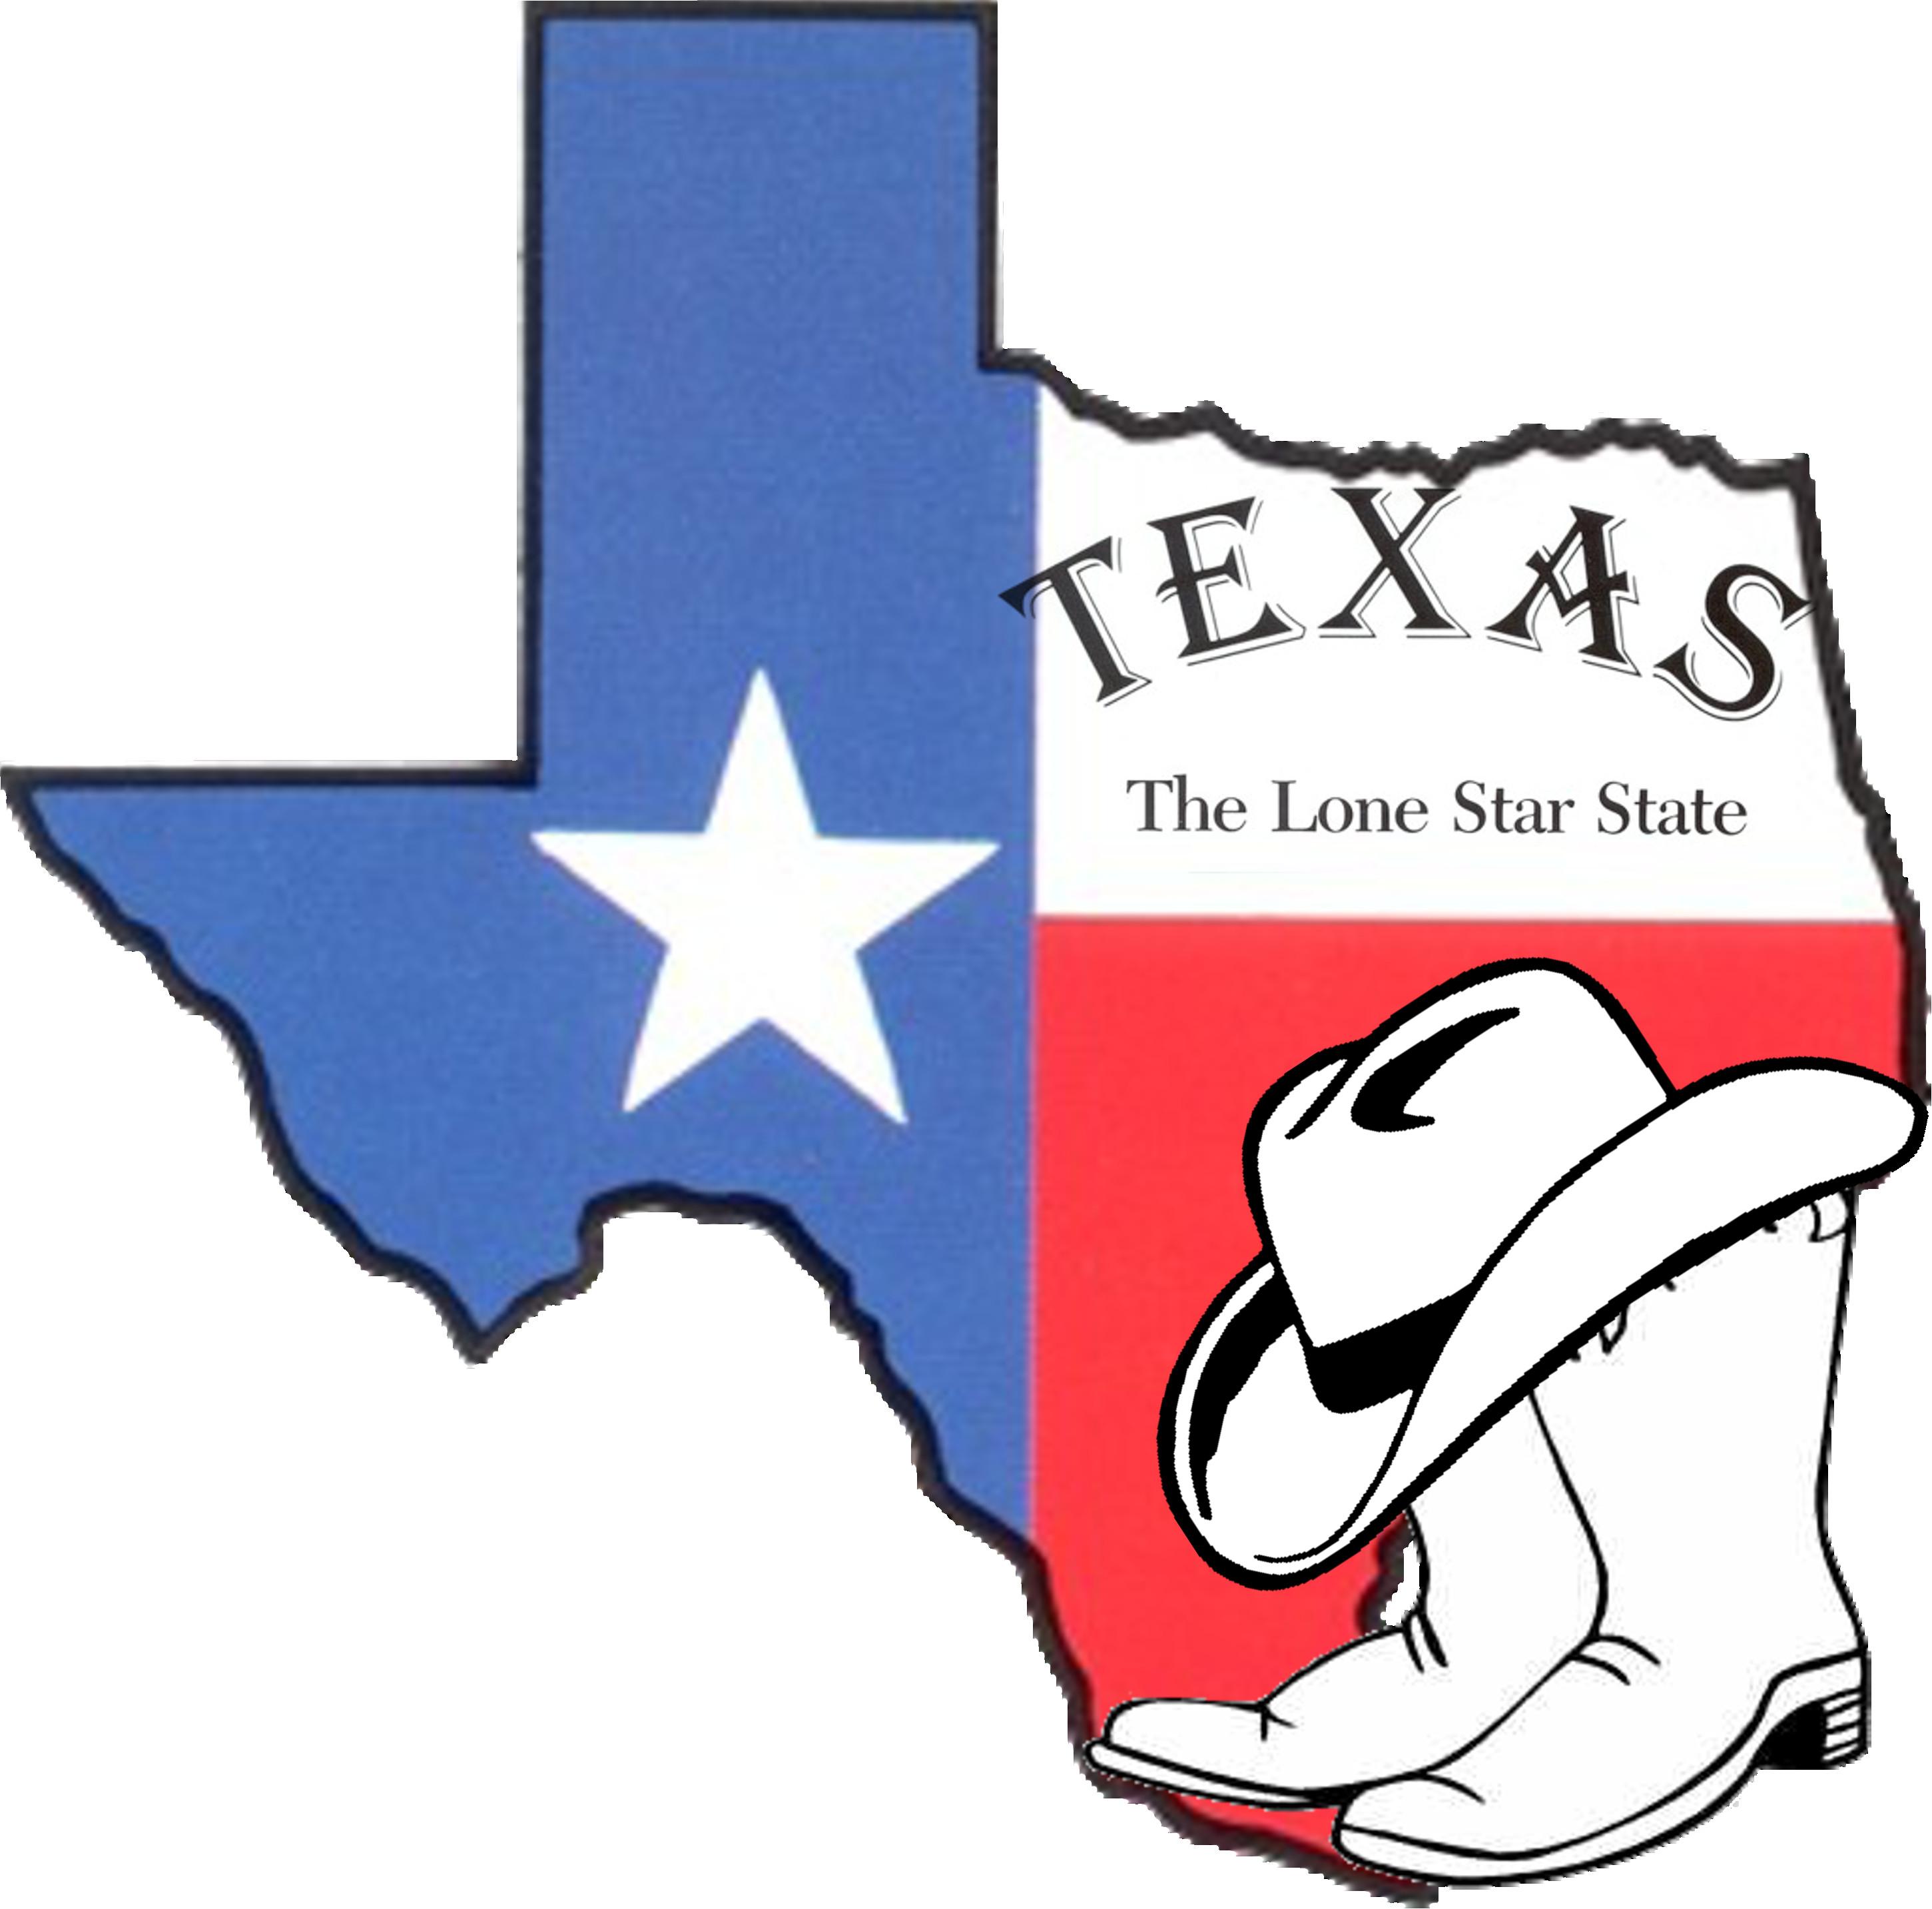 2901x2866 Texas Pictures Free Tx Logo Image Vector Clip Art Online Beauteous